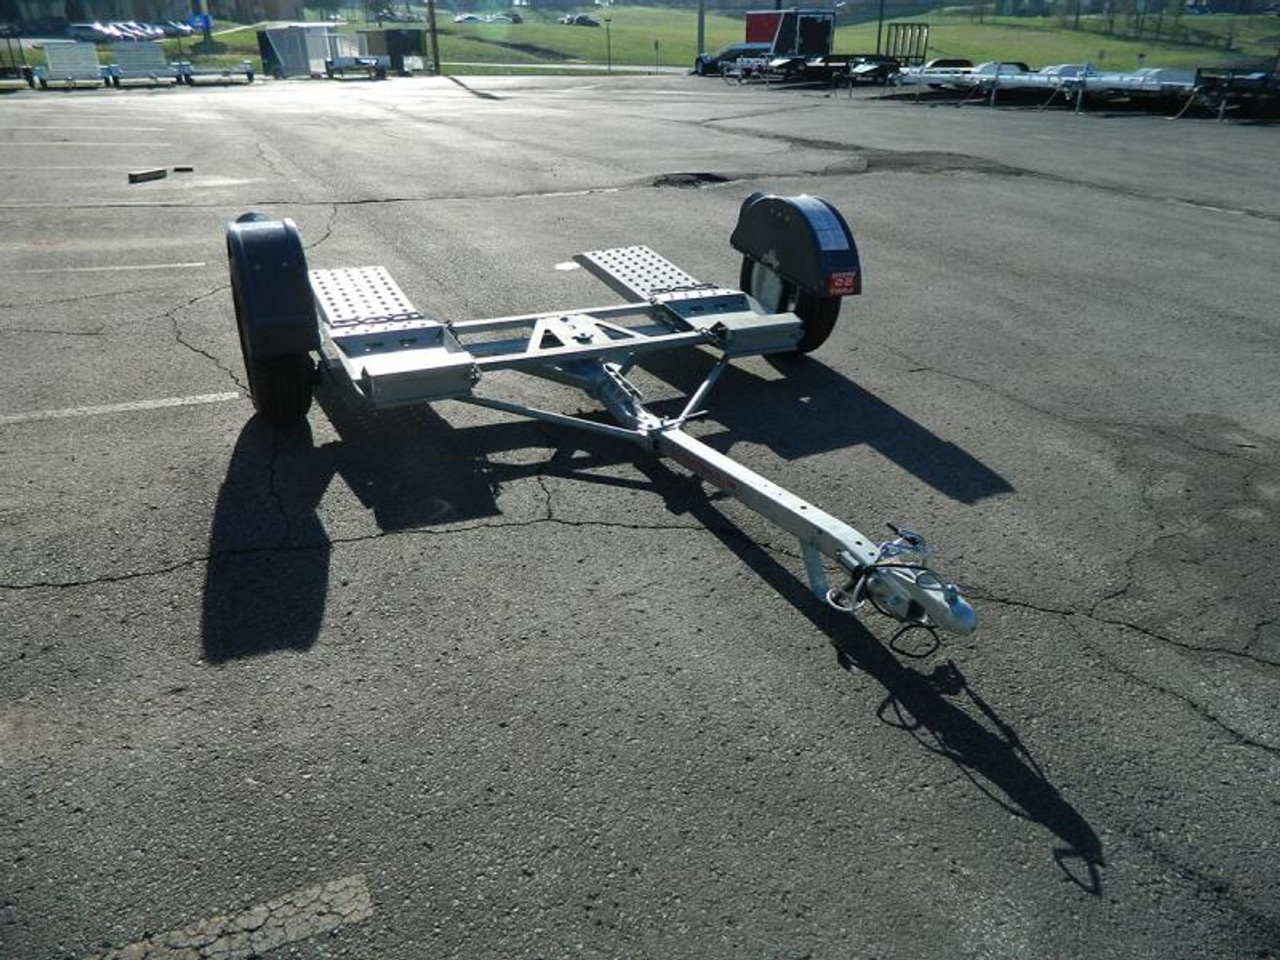 CGTD76 --- 2020 Croft Galvanized Tow Dolly - No Brakes #C0313